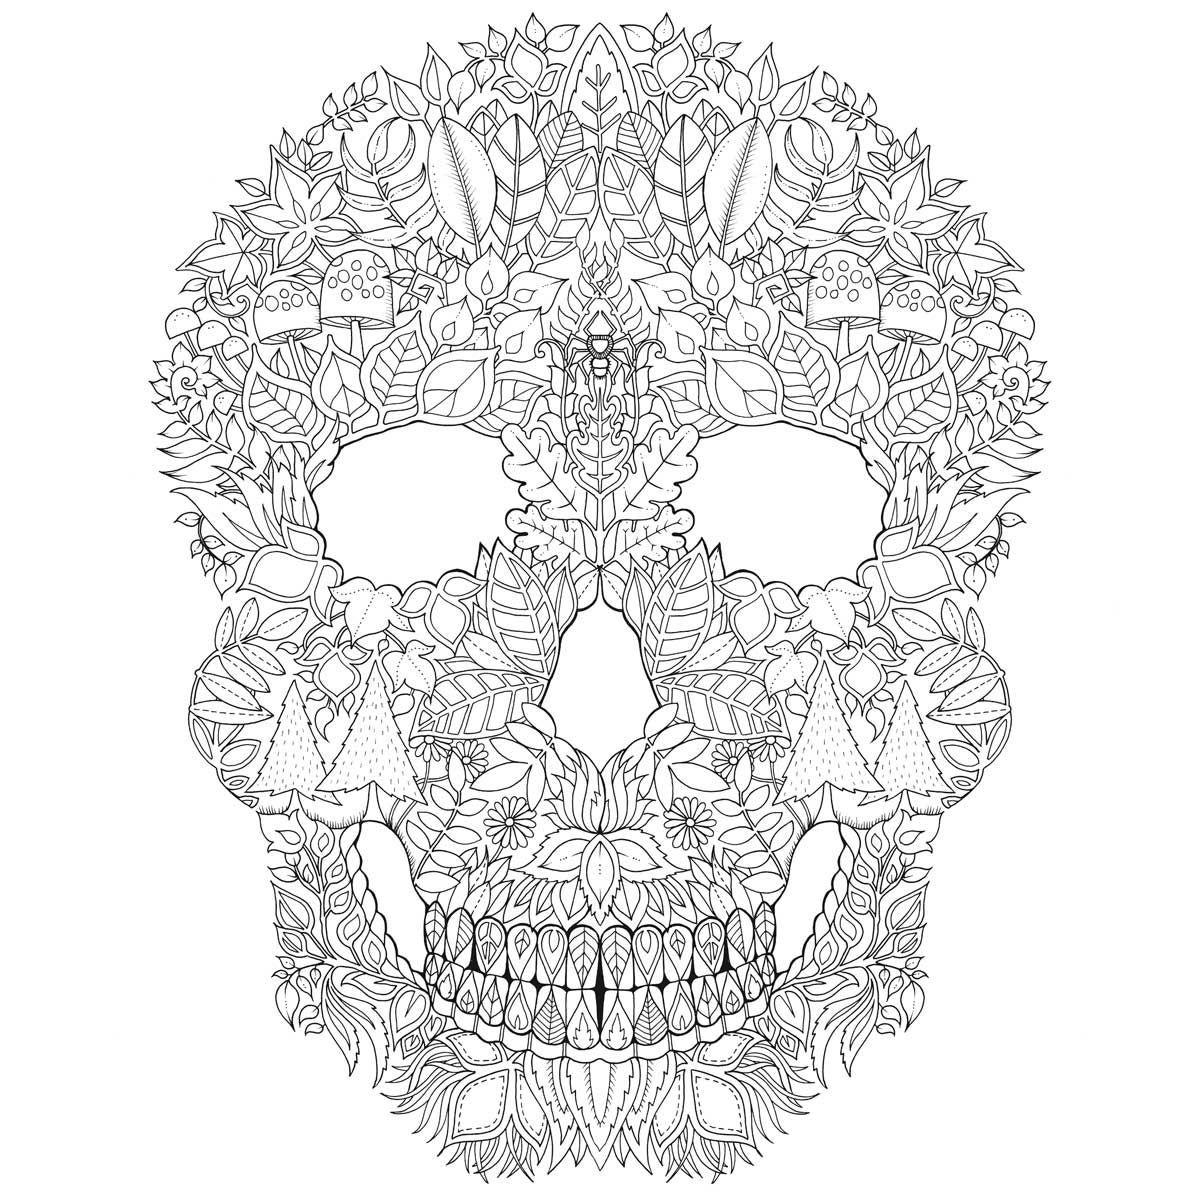 Zaczarowany Las Koloruj Szukaj Symboli Odkryj Tajemnice Skull Coloring Pages Animal Coloring Pages Johanna Basford Coloring Book